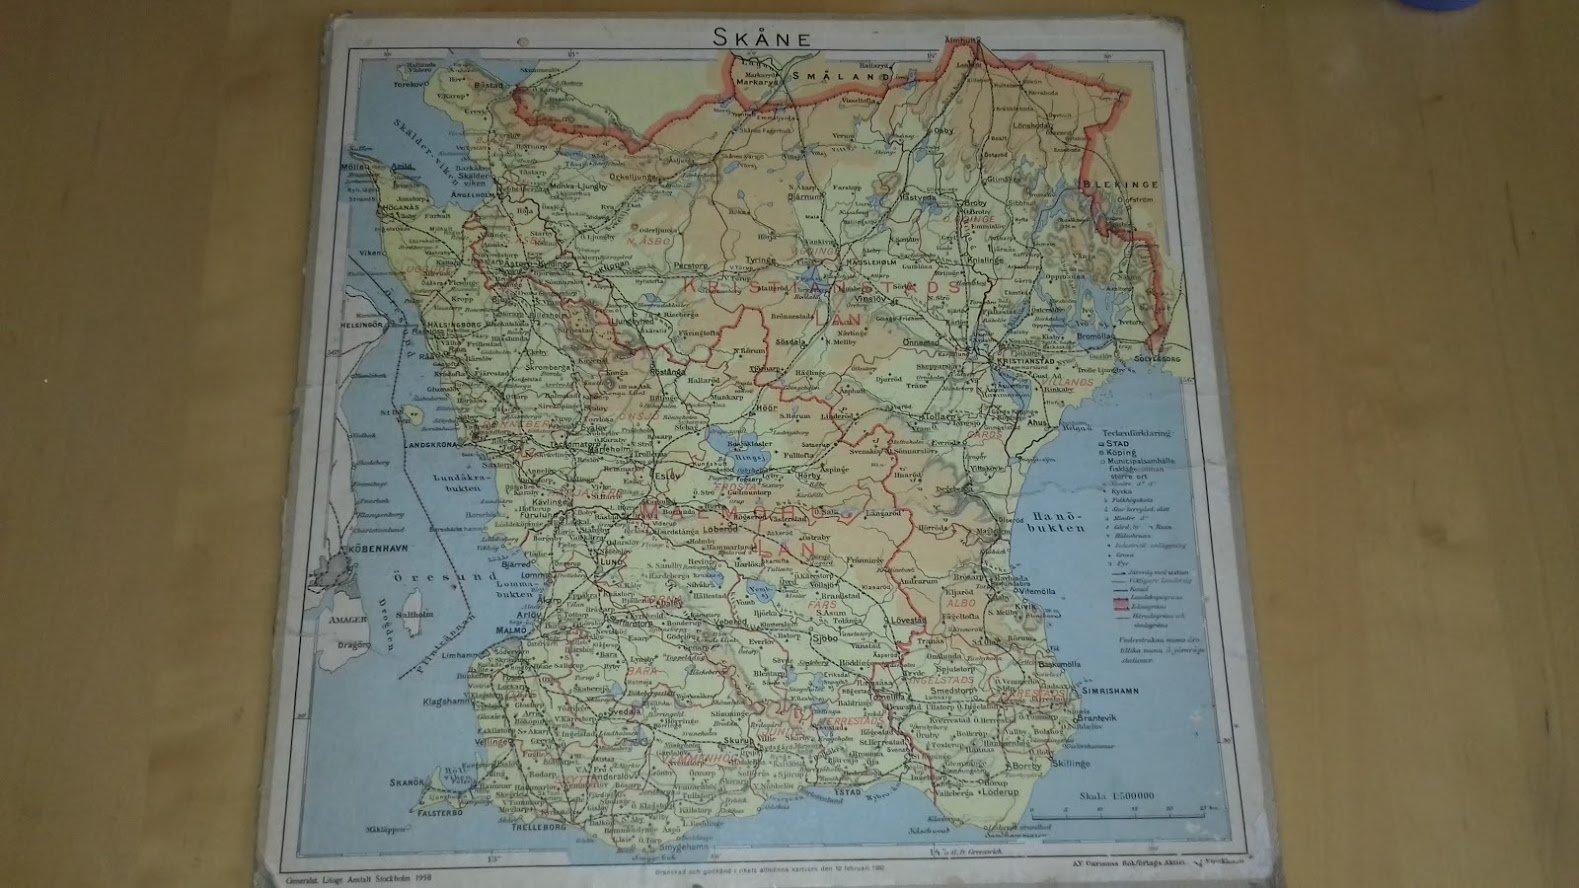 Karta Nordvastra Skane.Gammal Skane Karta 1958 344271694 ᐈ Kop Pa Tradera